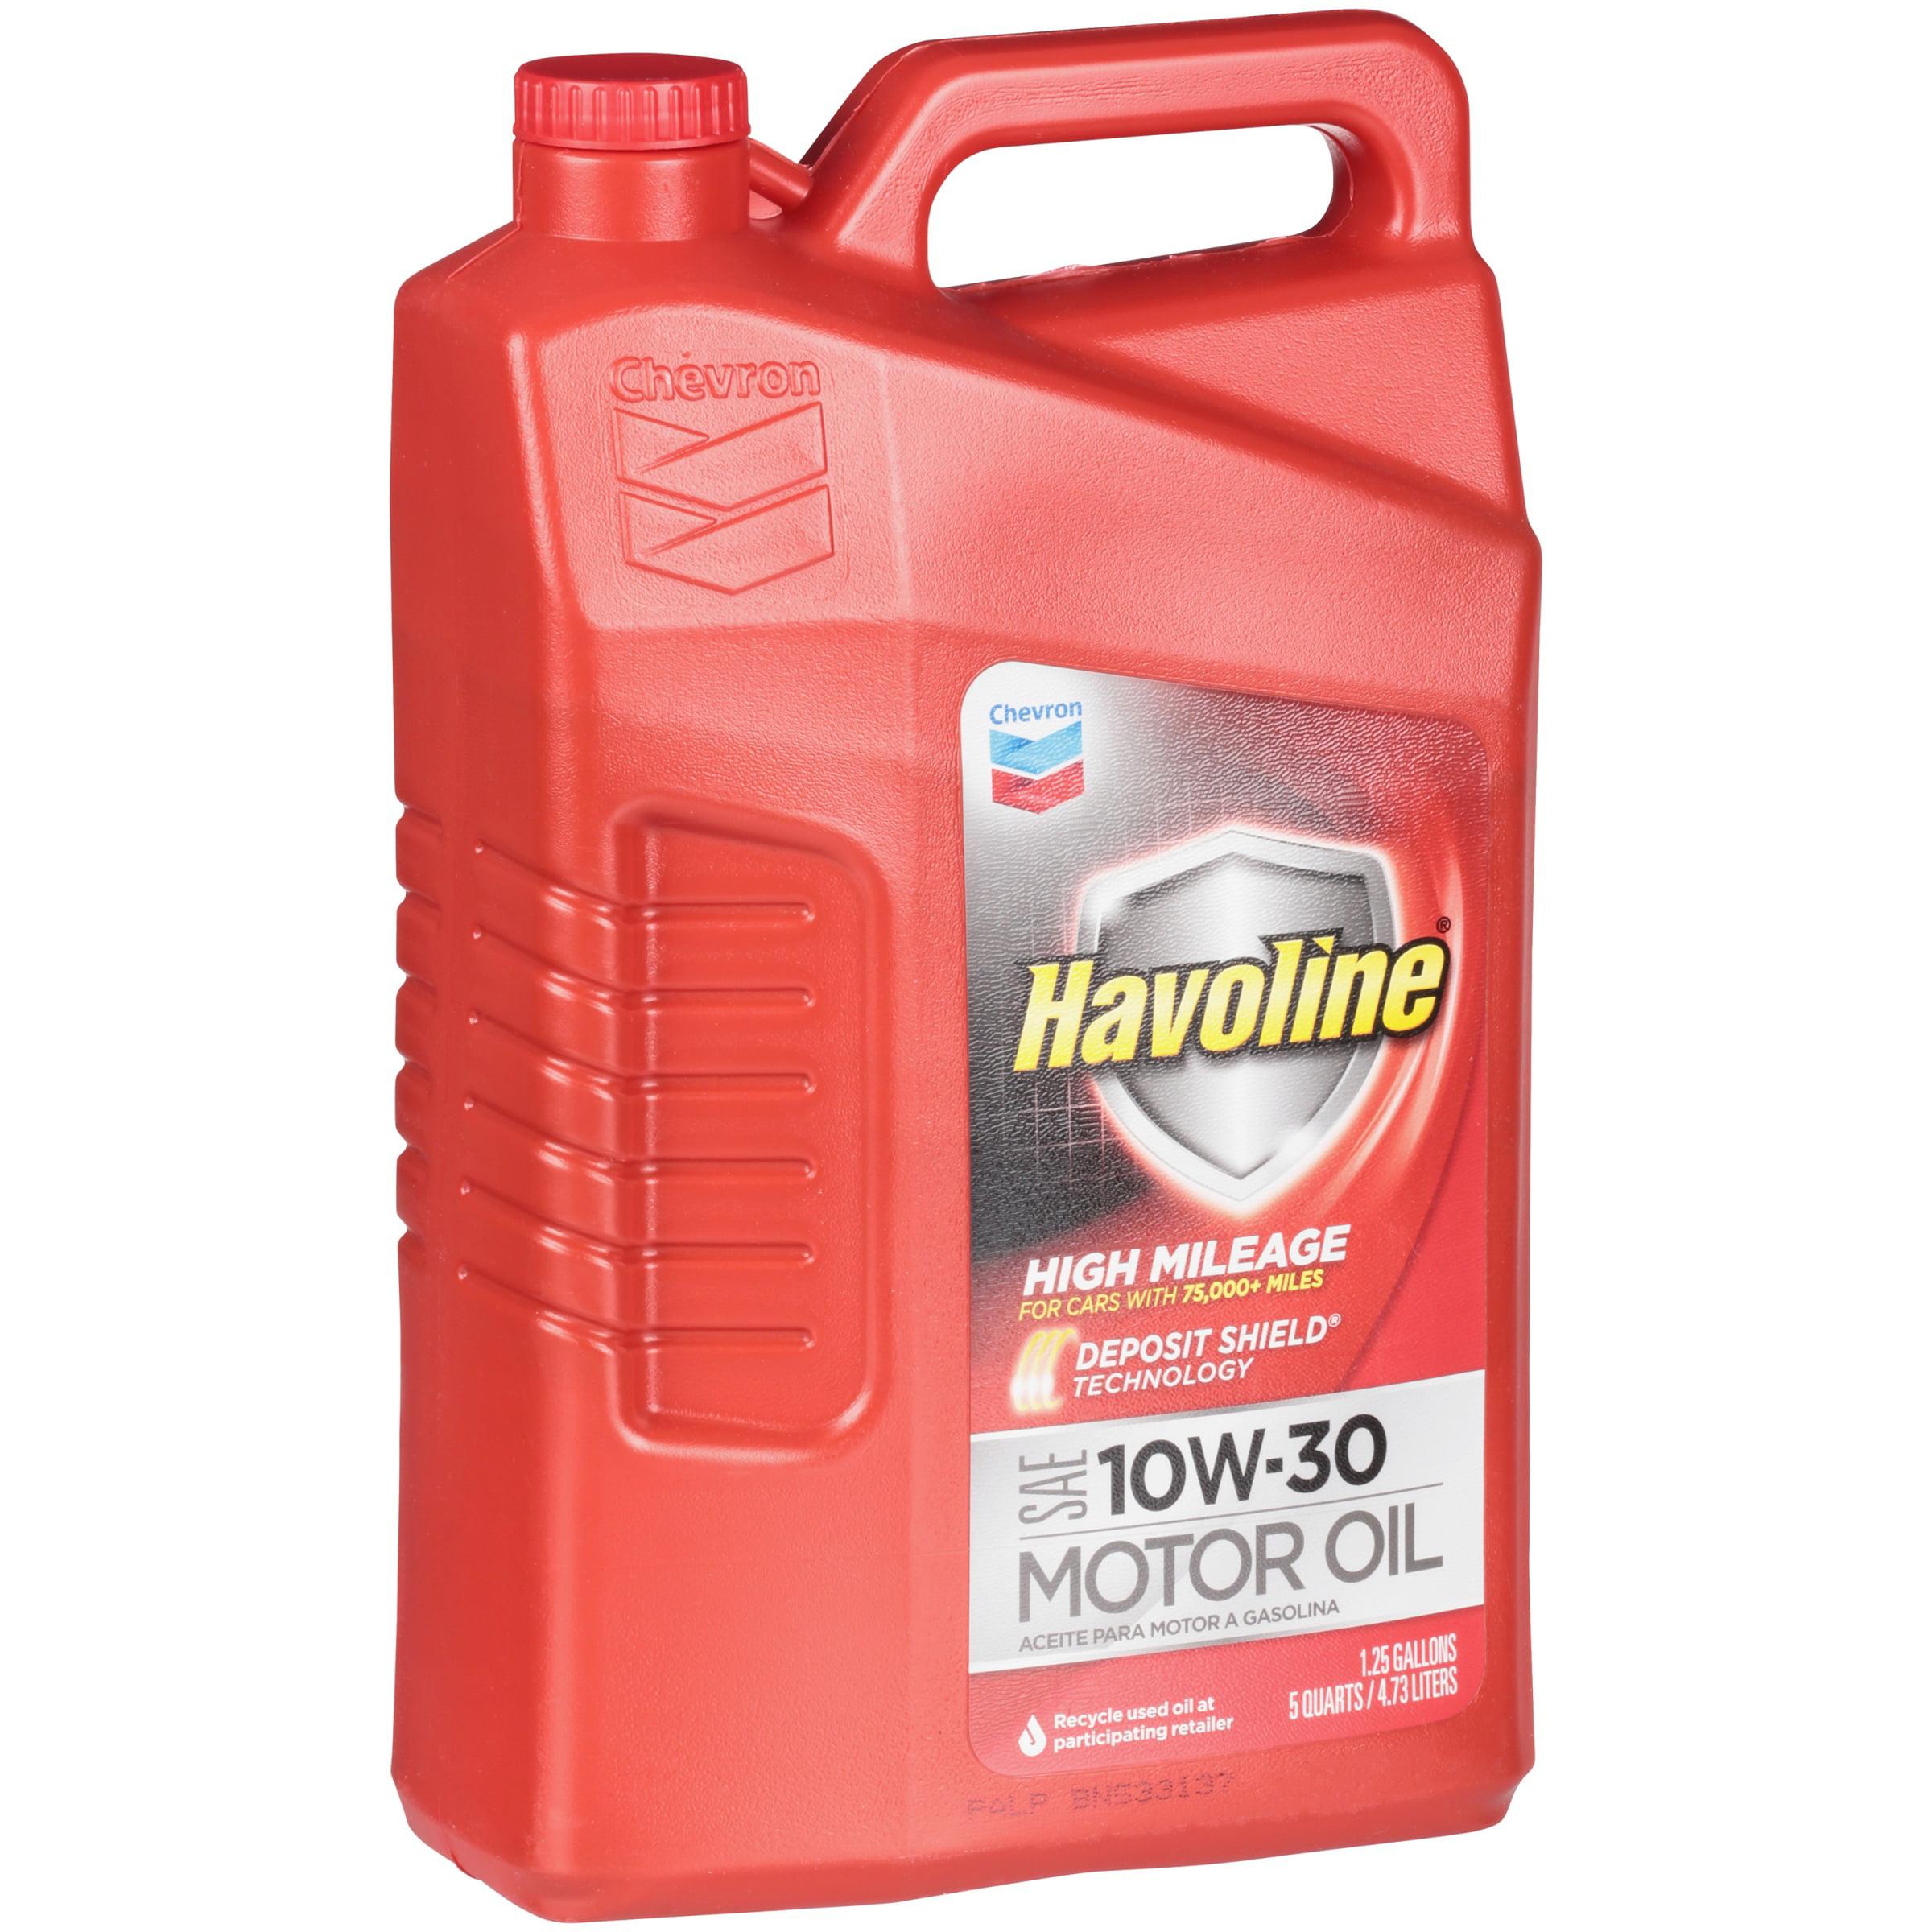 Havoline® High Mileage SAE 10W-30 Motor Oil 5 qt. Jug